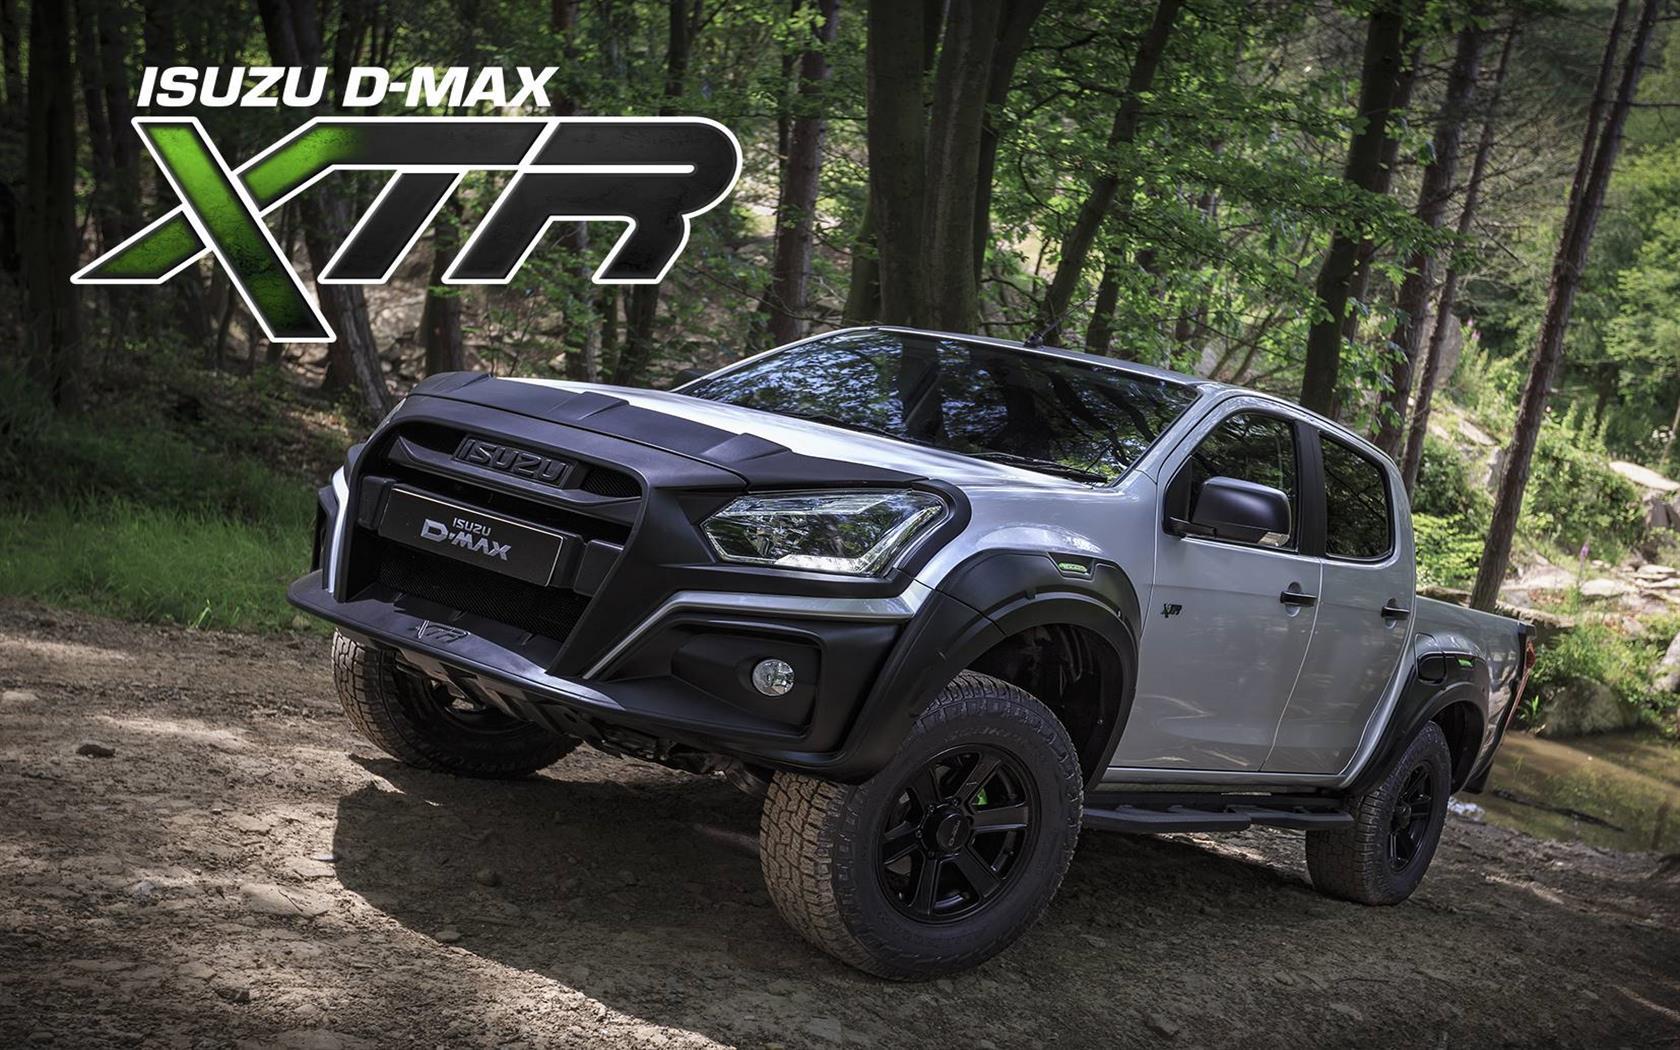 2019 Isuzu D-Max XTR